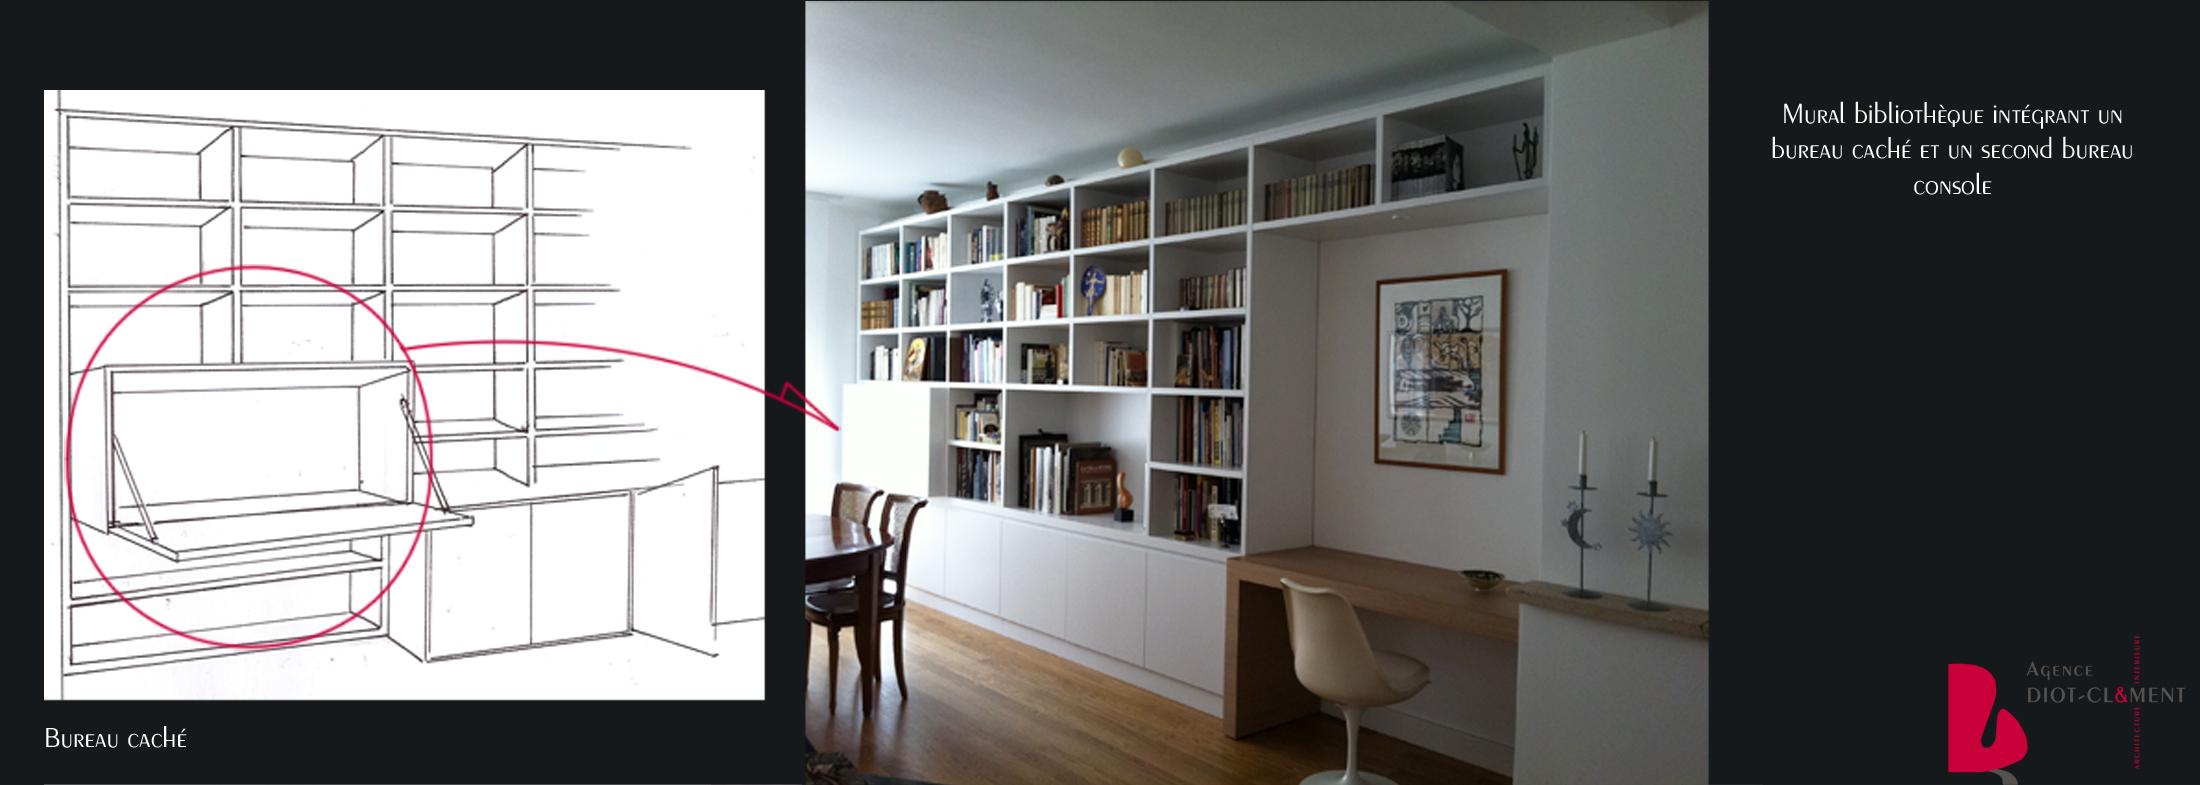 Biblioth ques agence diot clement - Bibliotheque avec bureau integre ...